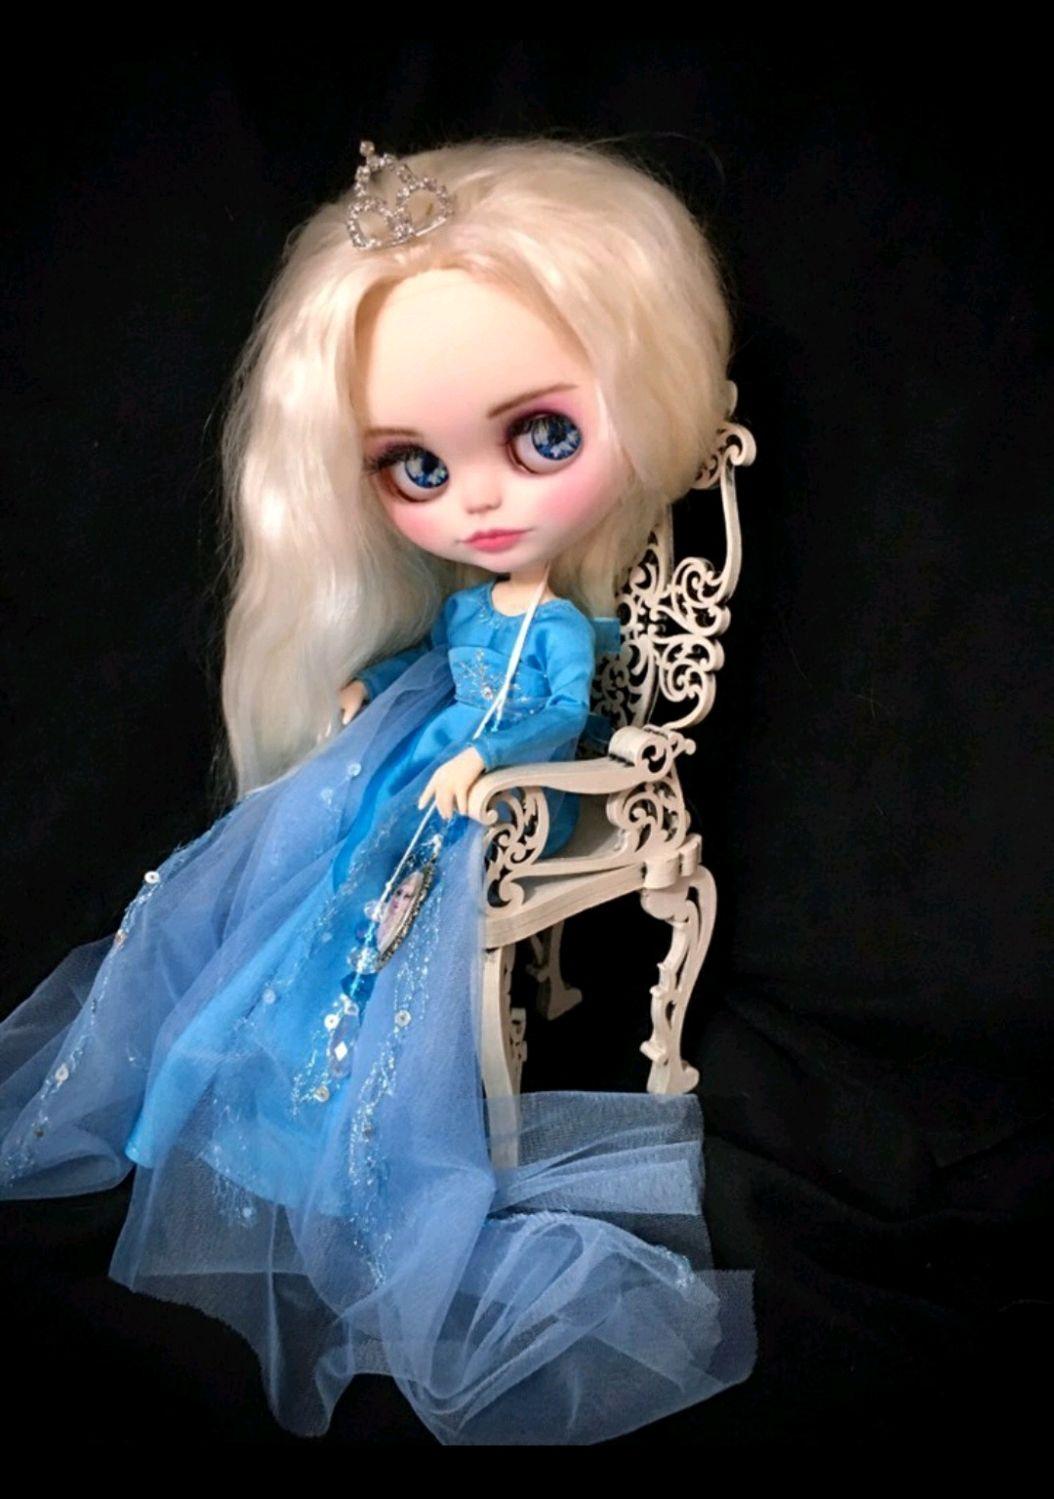 Стул для блайз, Куклы и пупсы, Бийск,  Фото №1